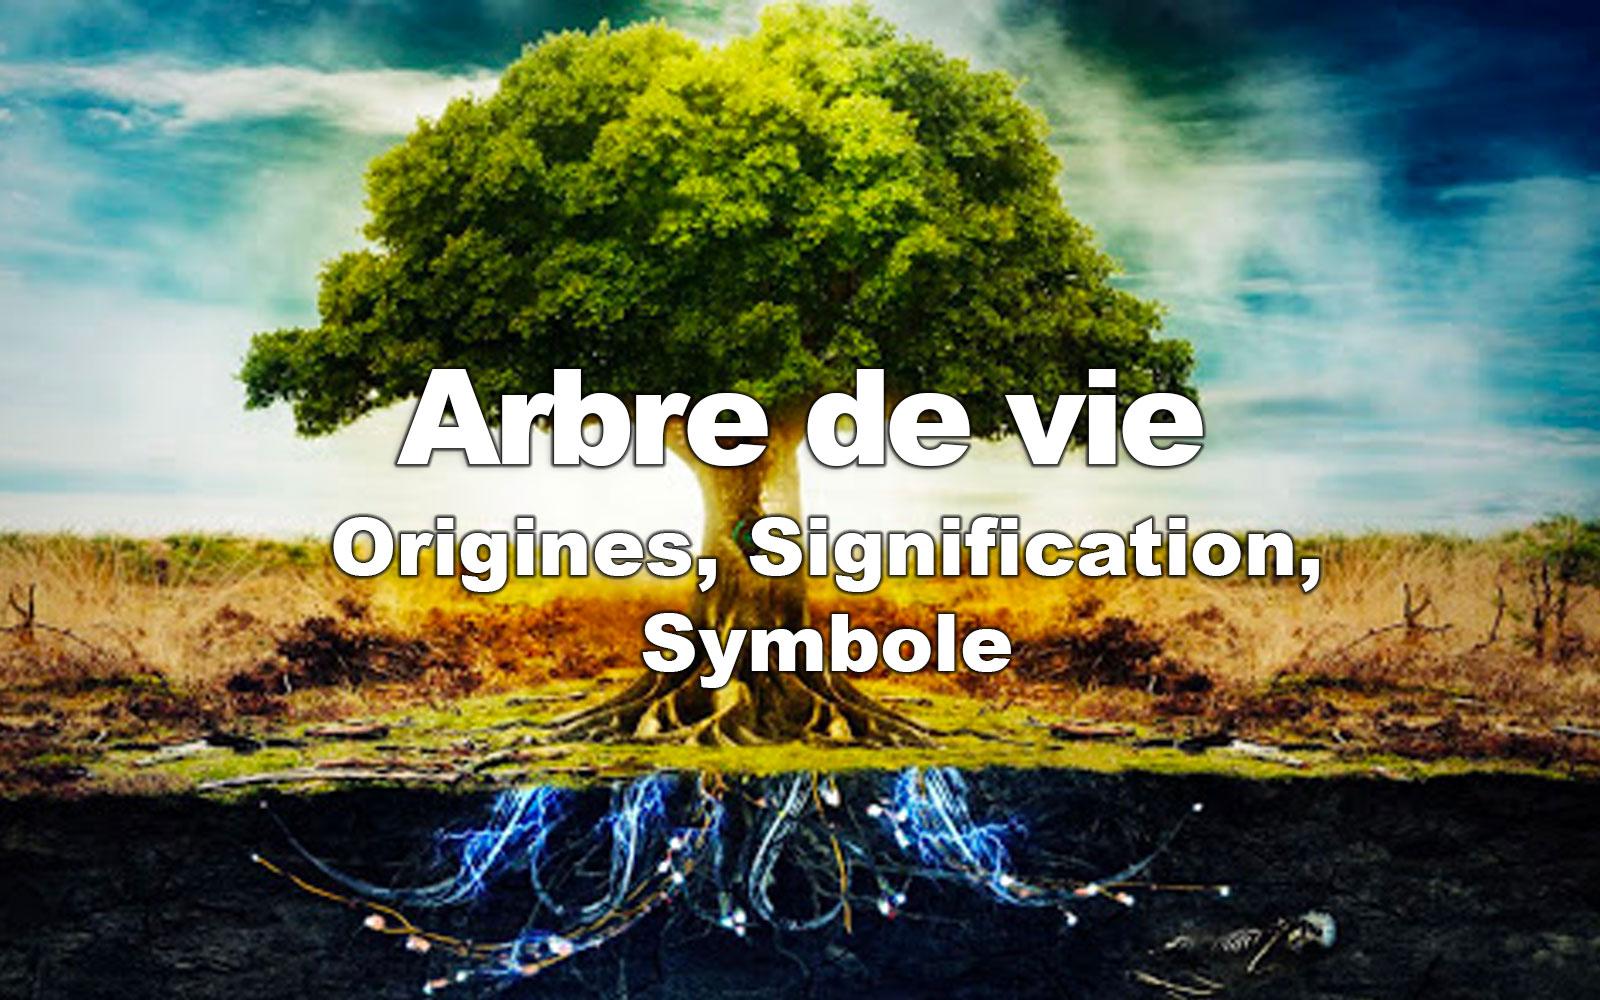 Arbre de vie : Origines, Signification, Symboles